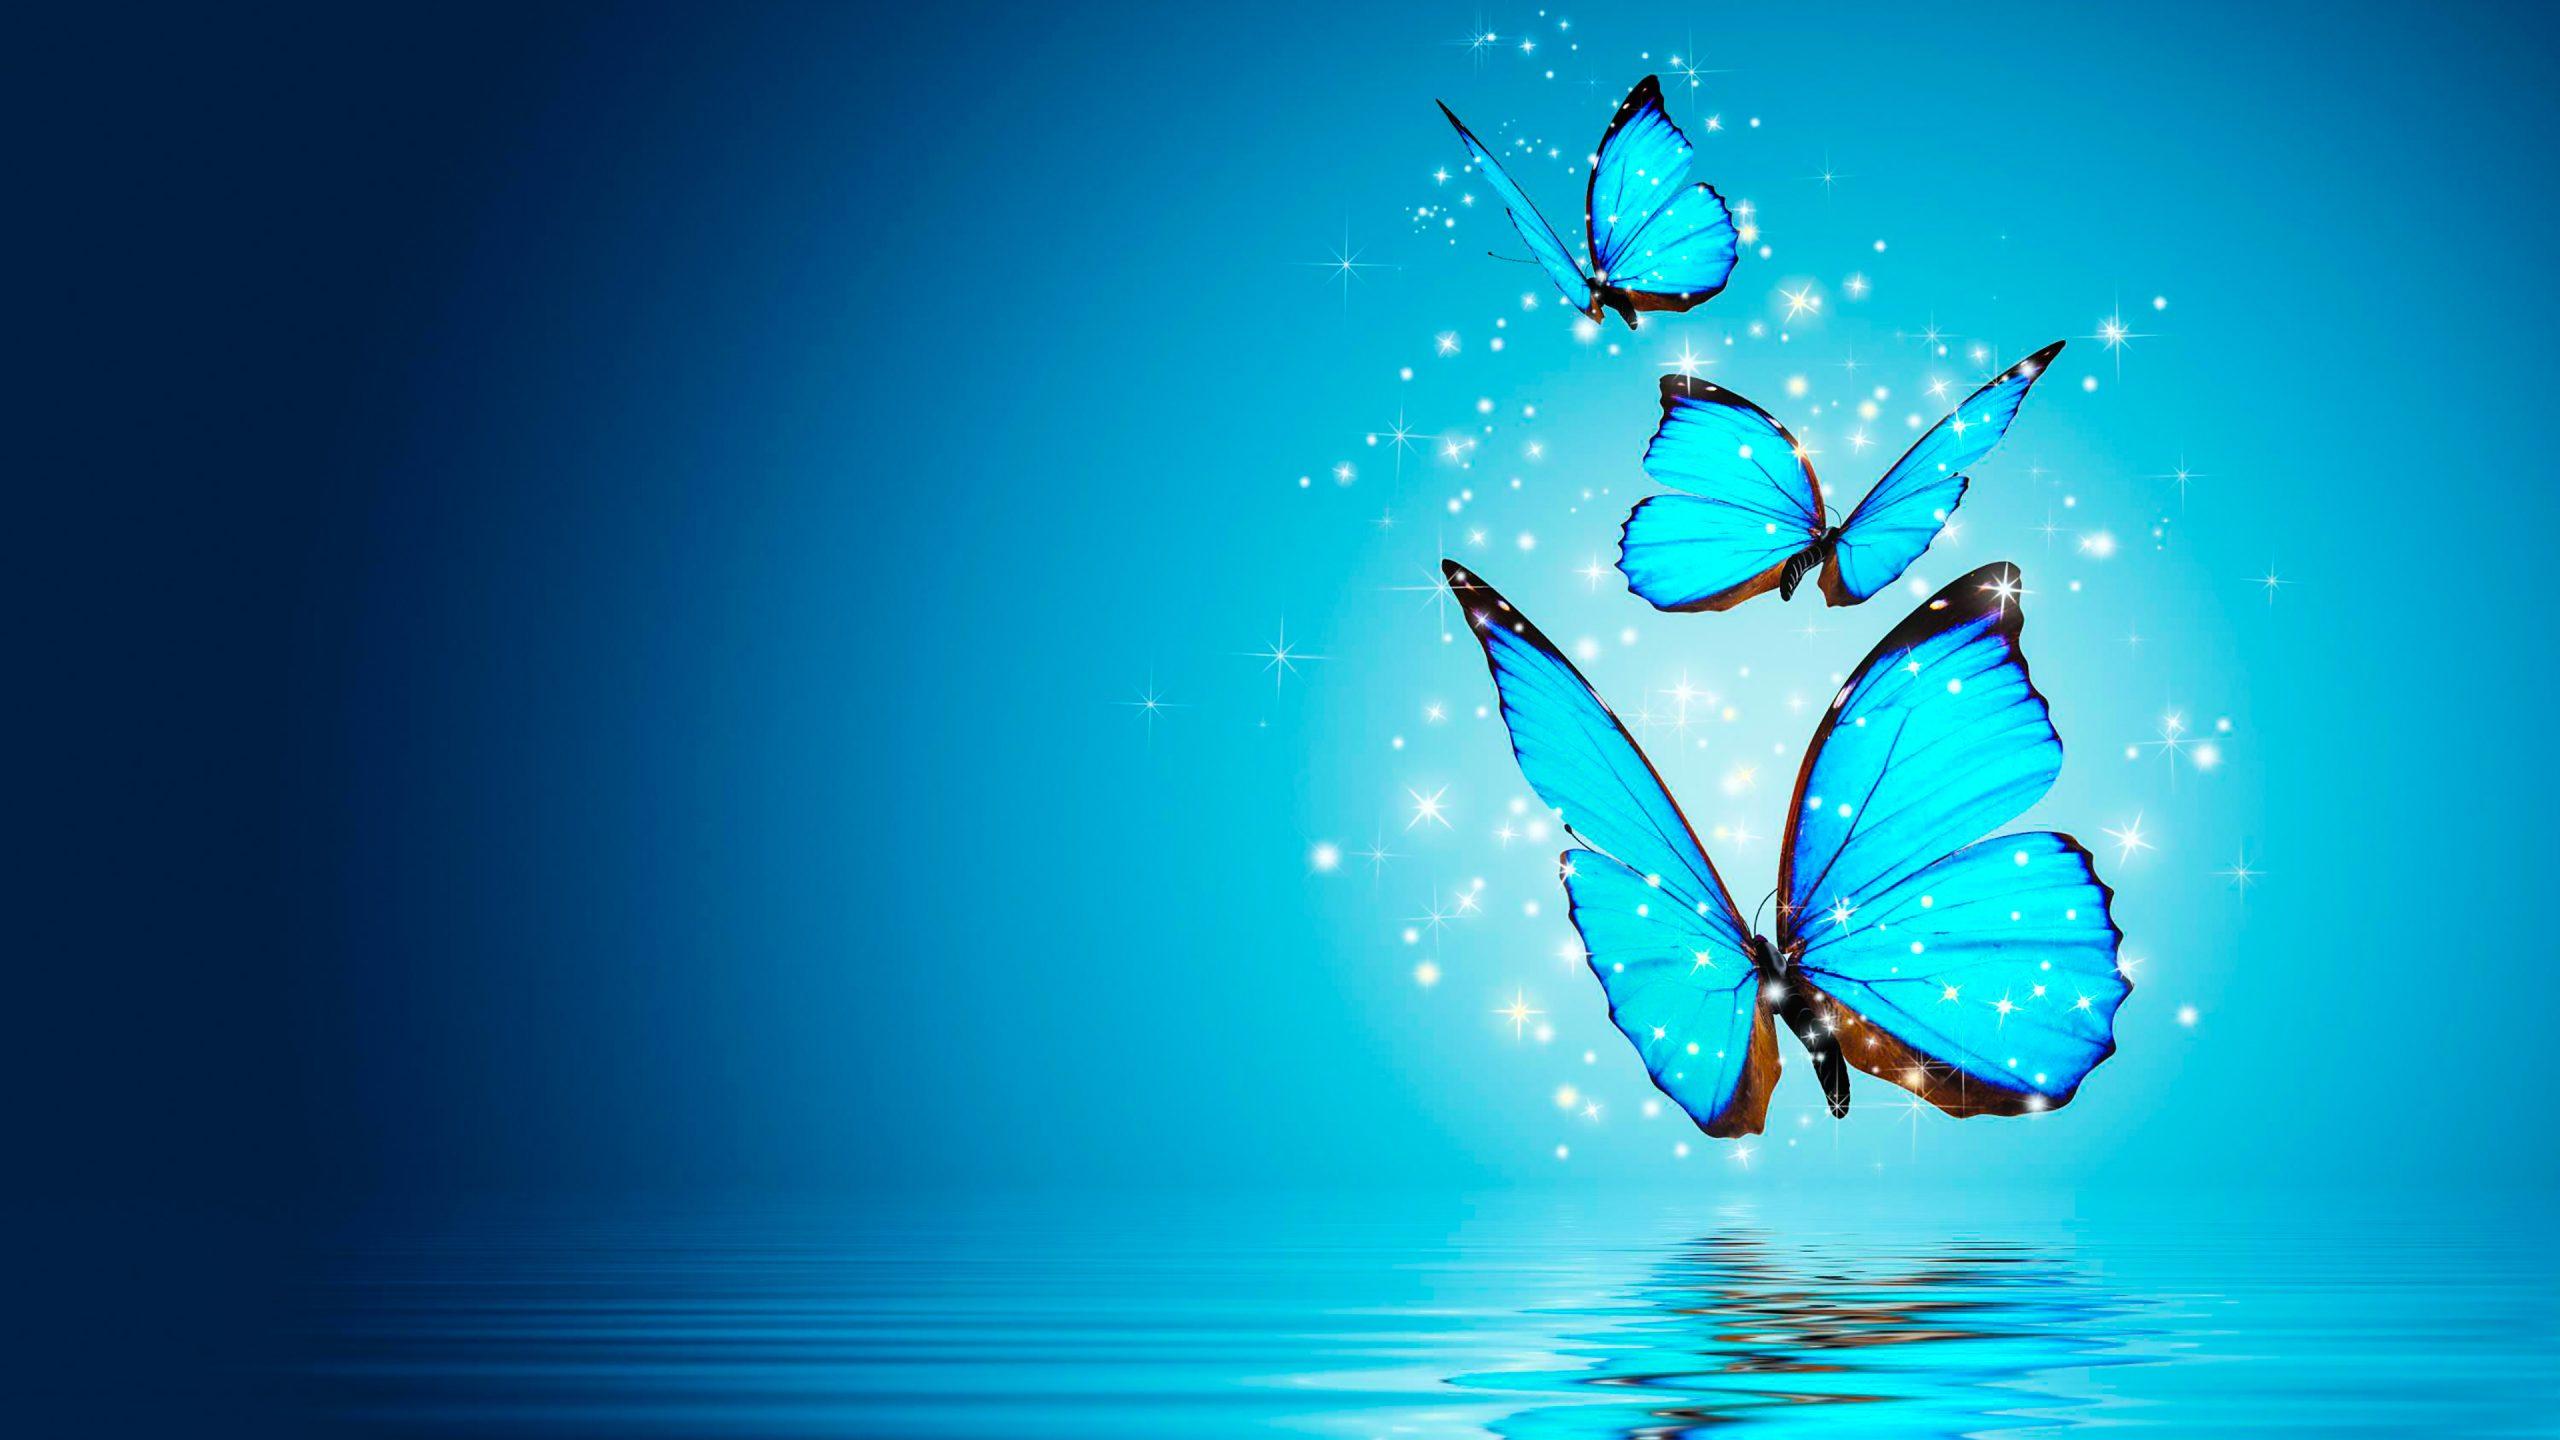 Butterfly Blue Water Magical 4K Wallpaper - Best Wallpapers